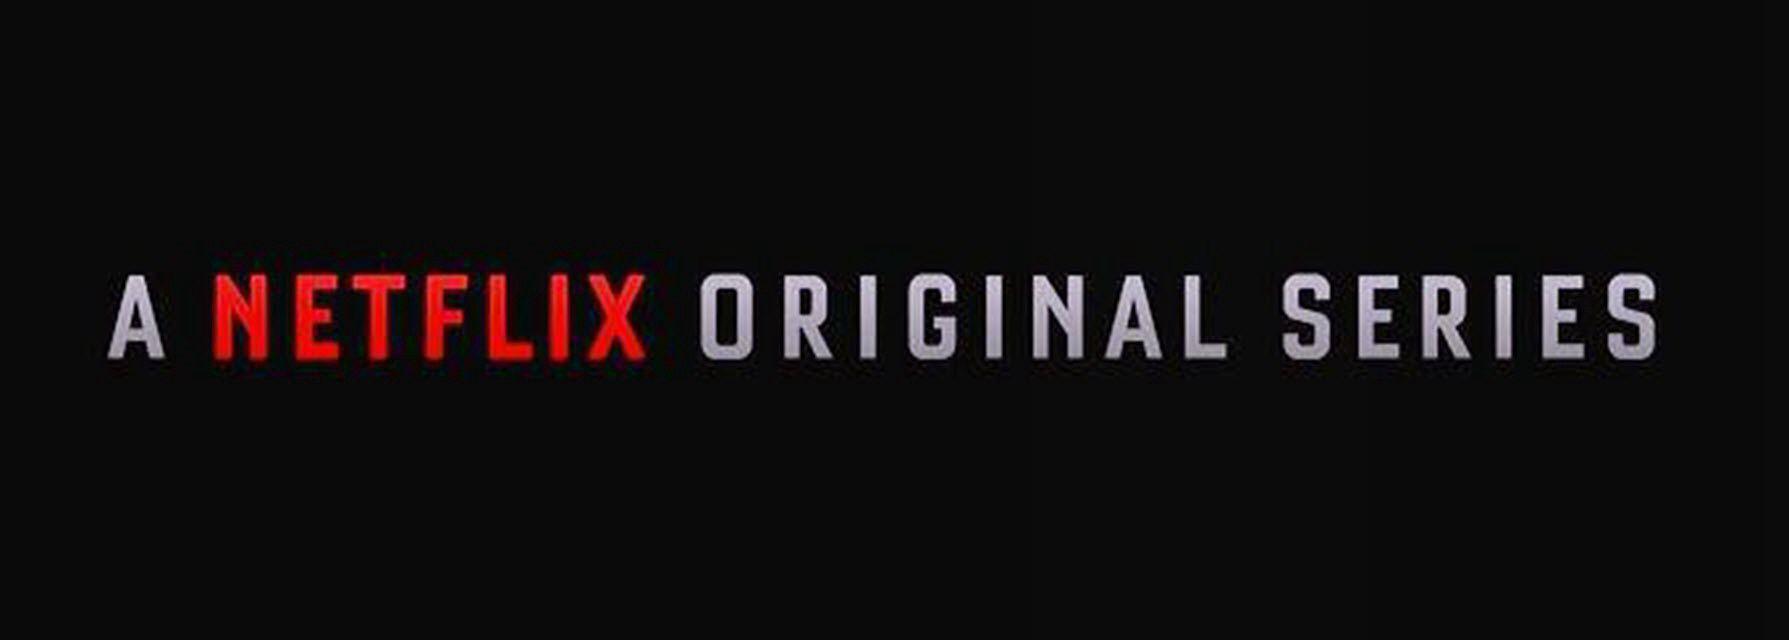 Best Netflix Originals